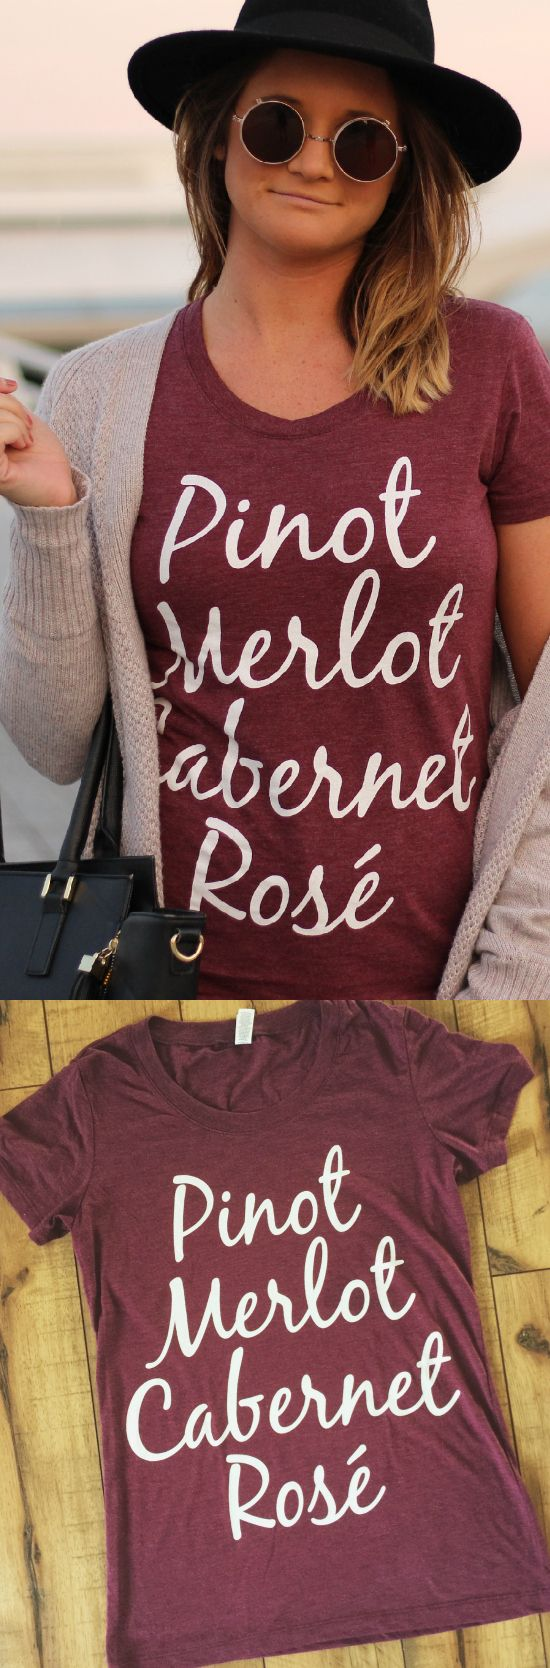 Wine Shirt By Folklore Couture Wineshirt Wine Shirts Fashion Rose T Shirt